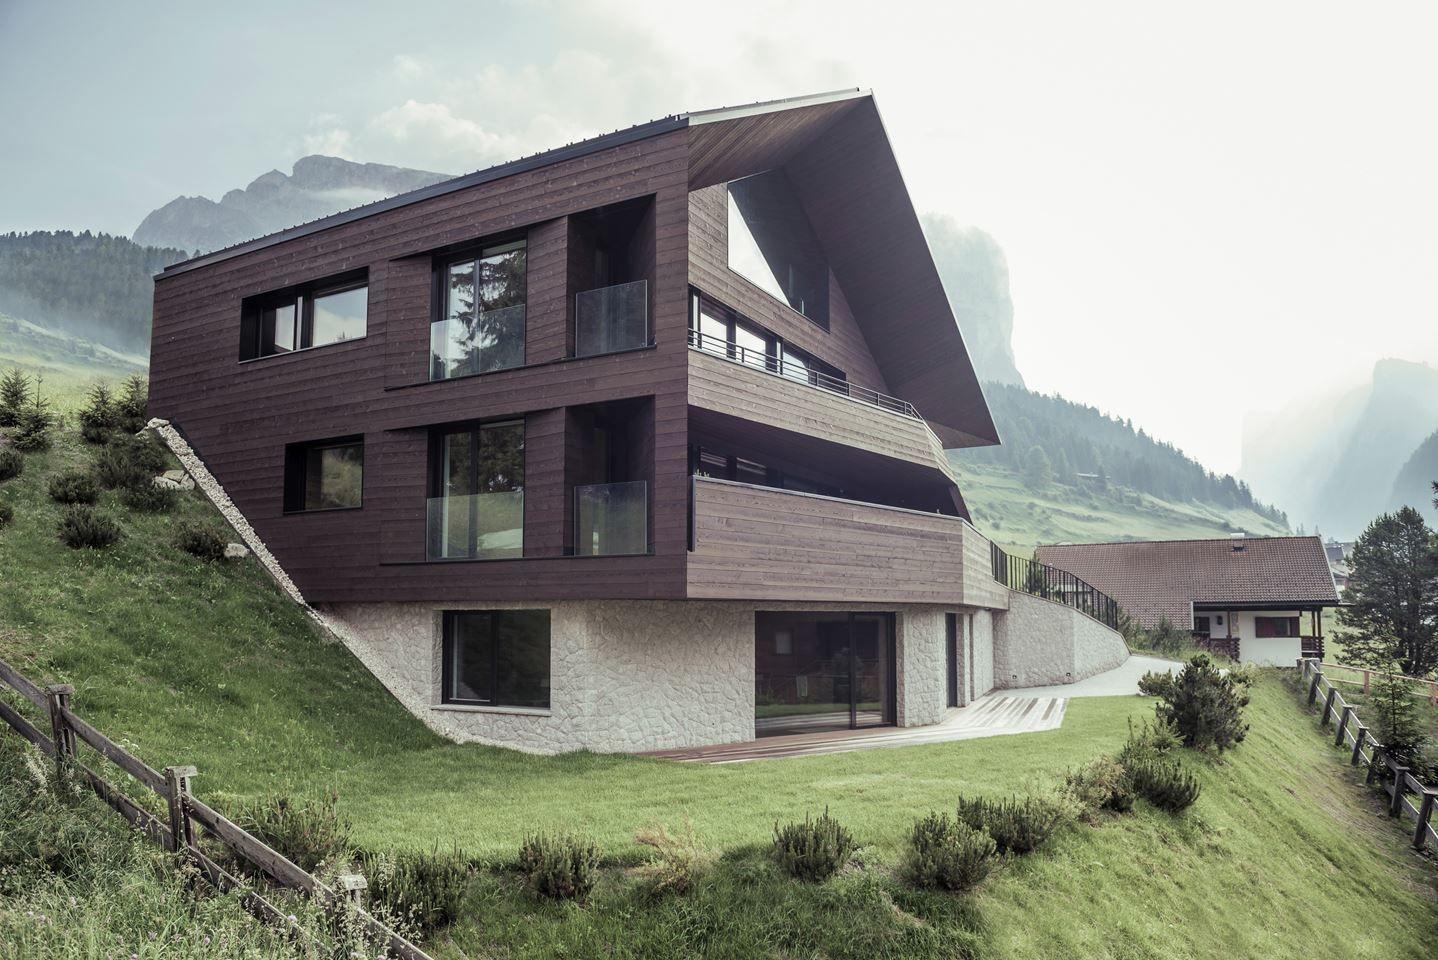 454c666a441d2f86bf450b538616936a - Hotel Tyrol Selva Di Val Gardena